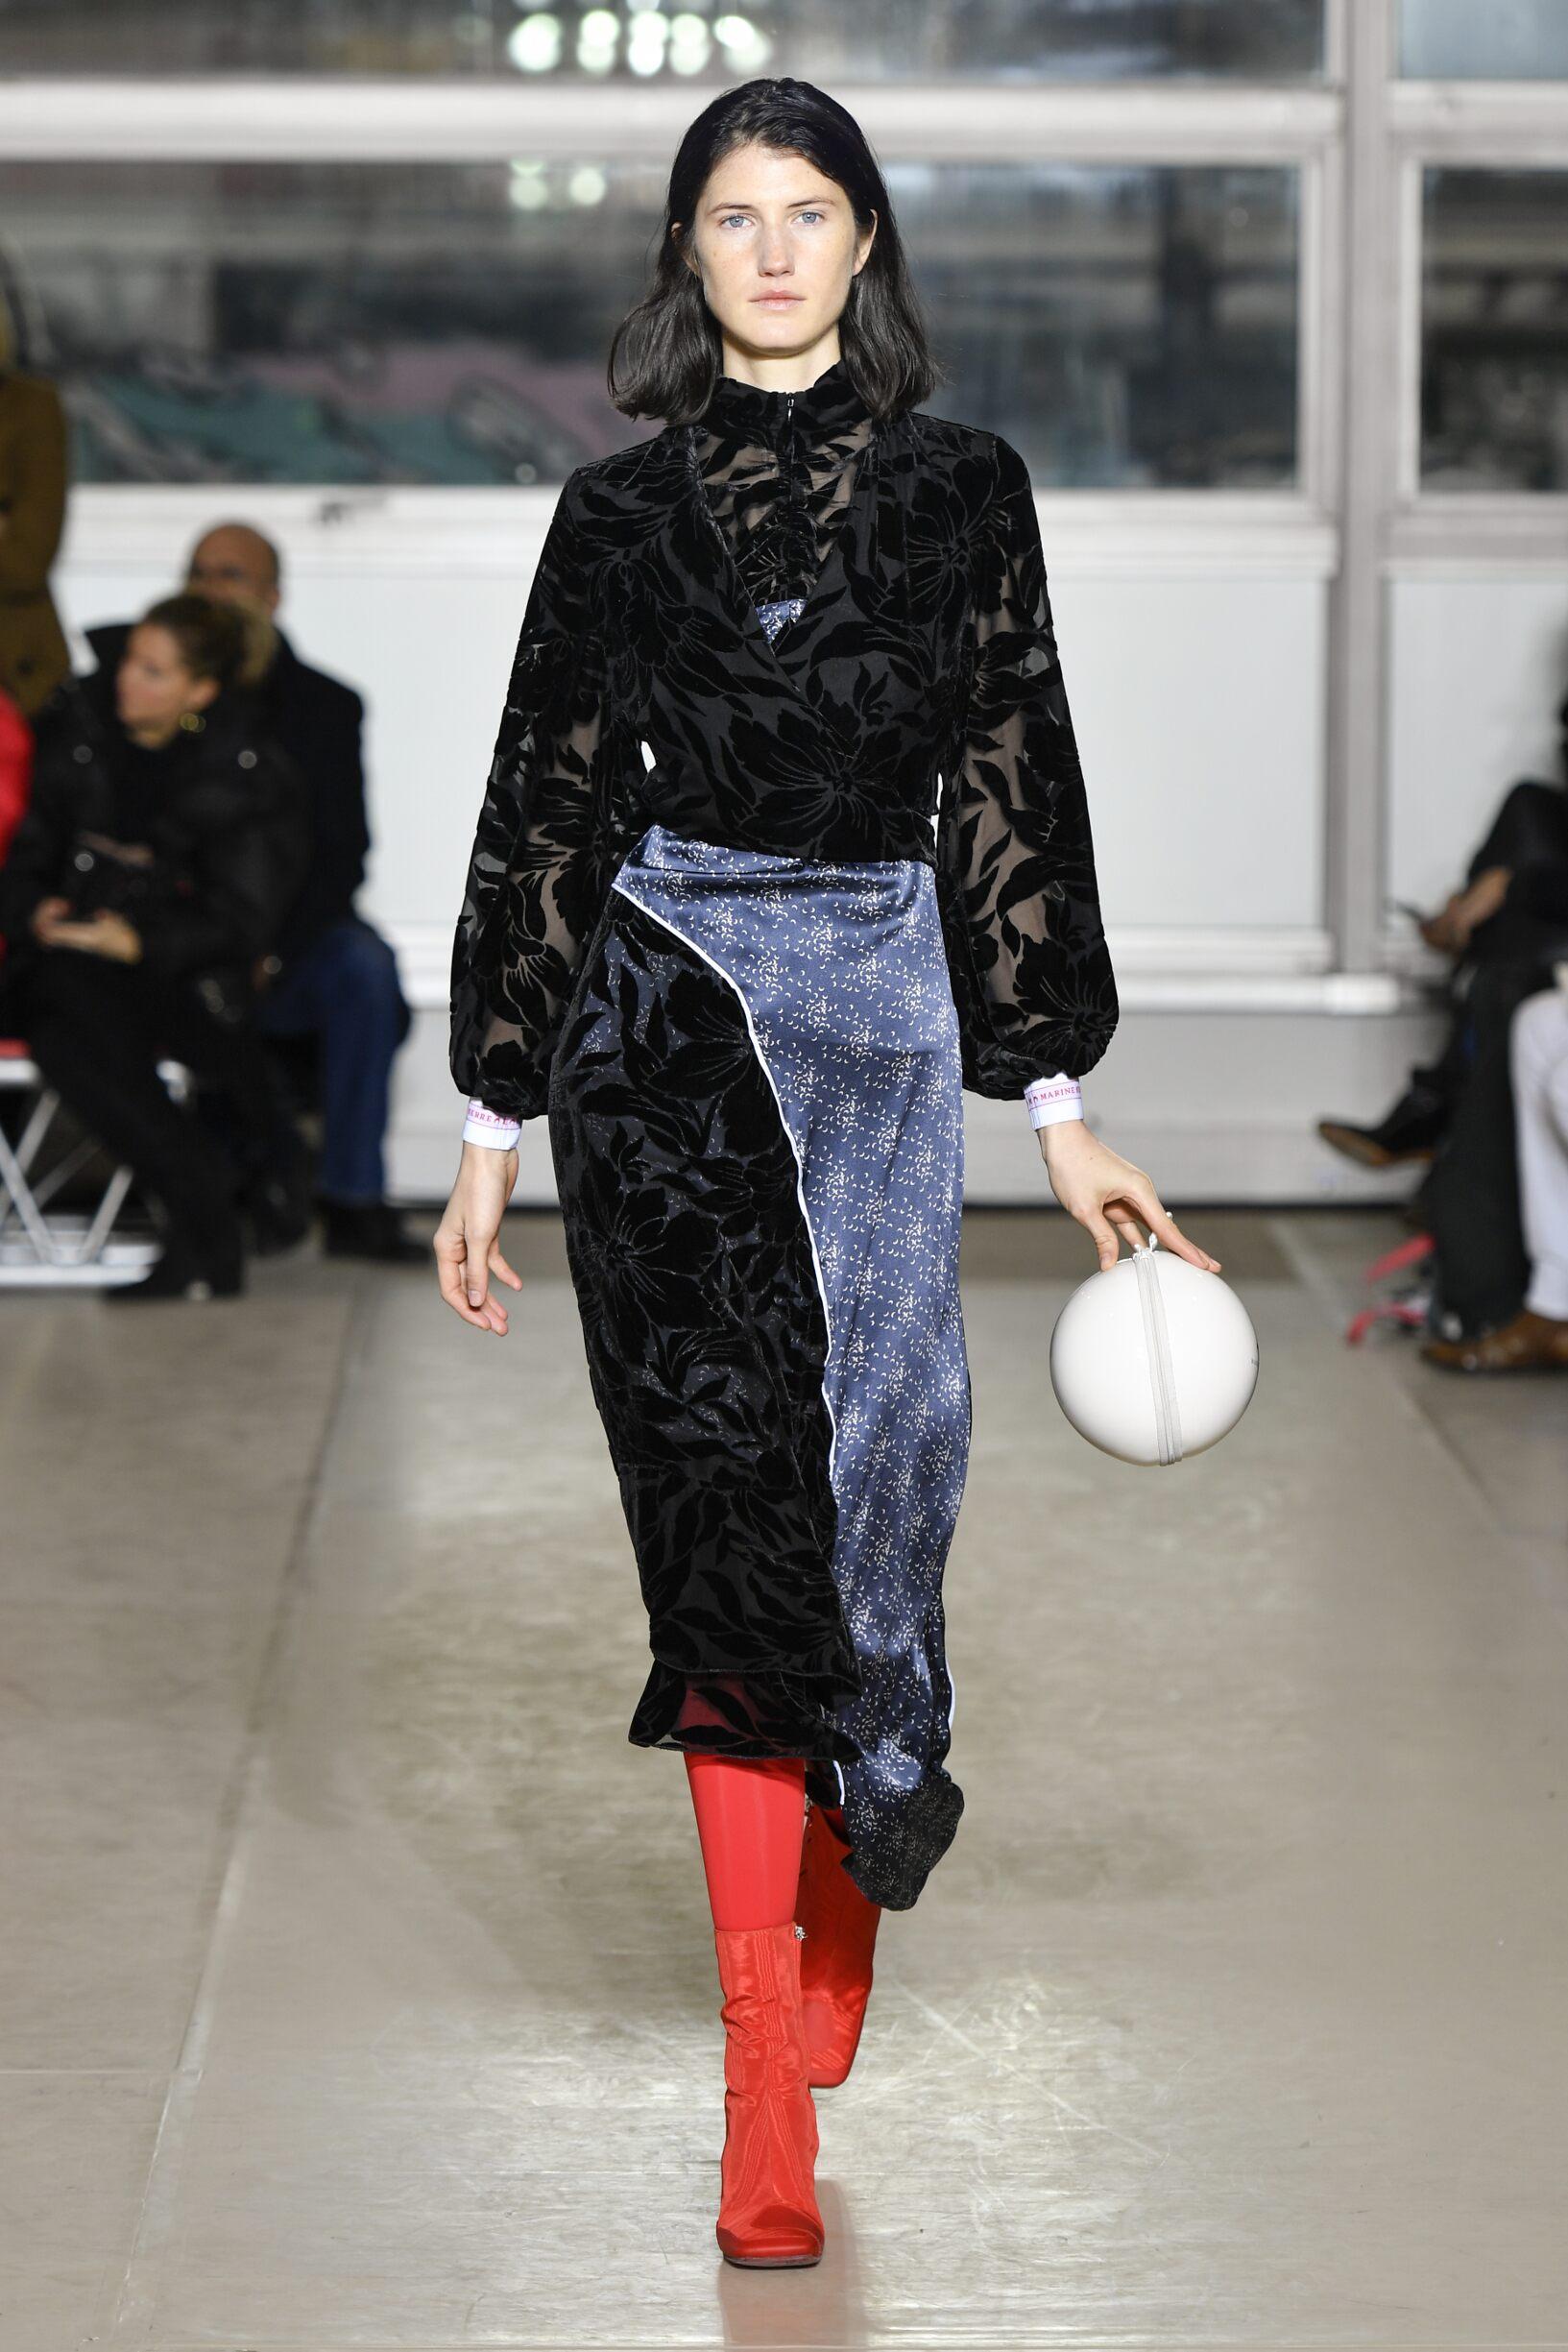 Fall Fashion Woman Trends 2018 Marine Serre